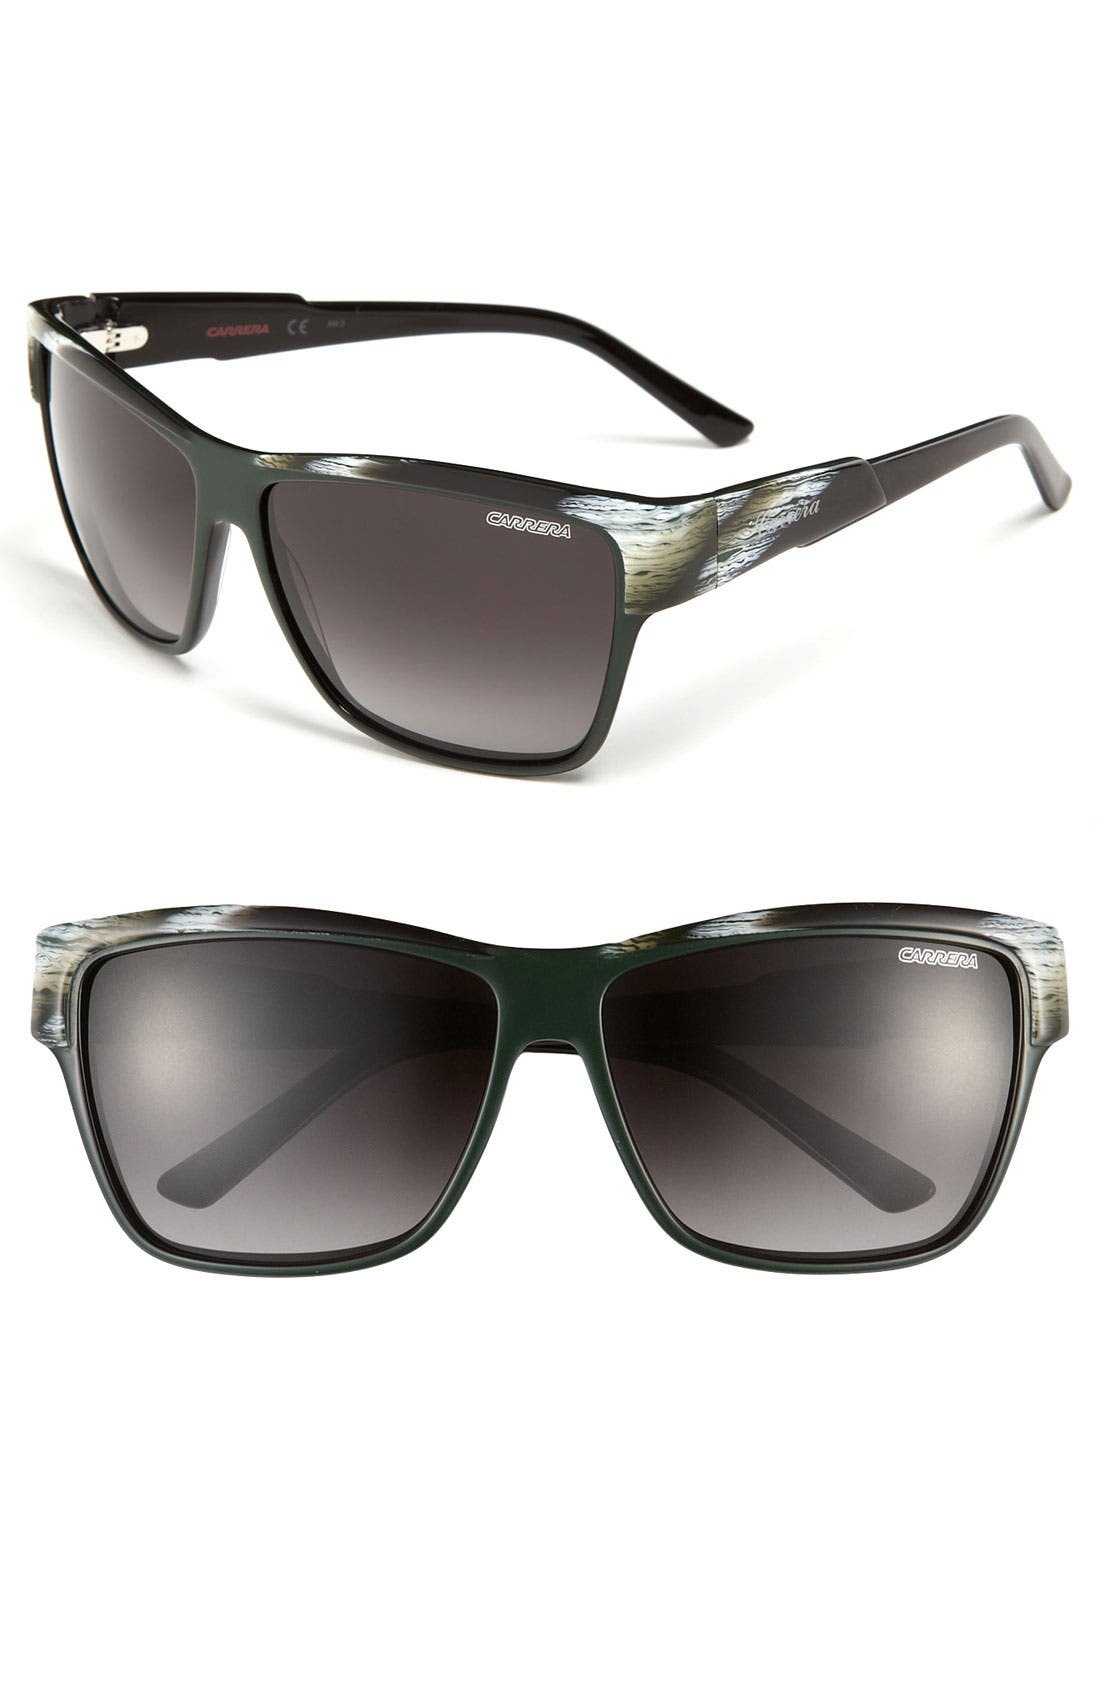 Alternate Image 1 Selected - Carrera Eyewear 59mm Retro Polarized Sunglasses